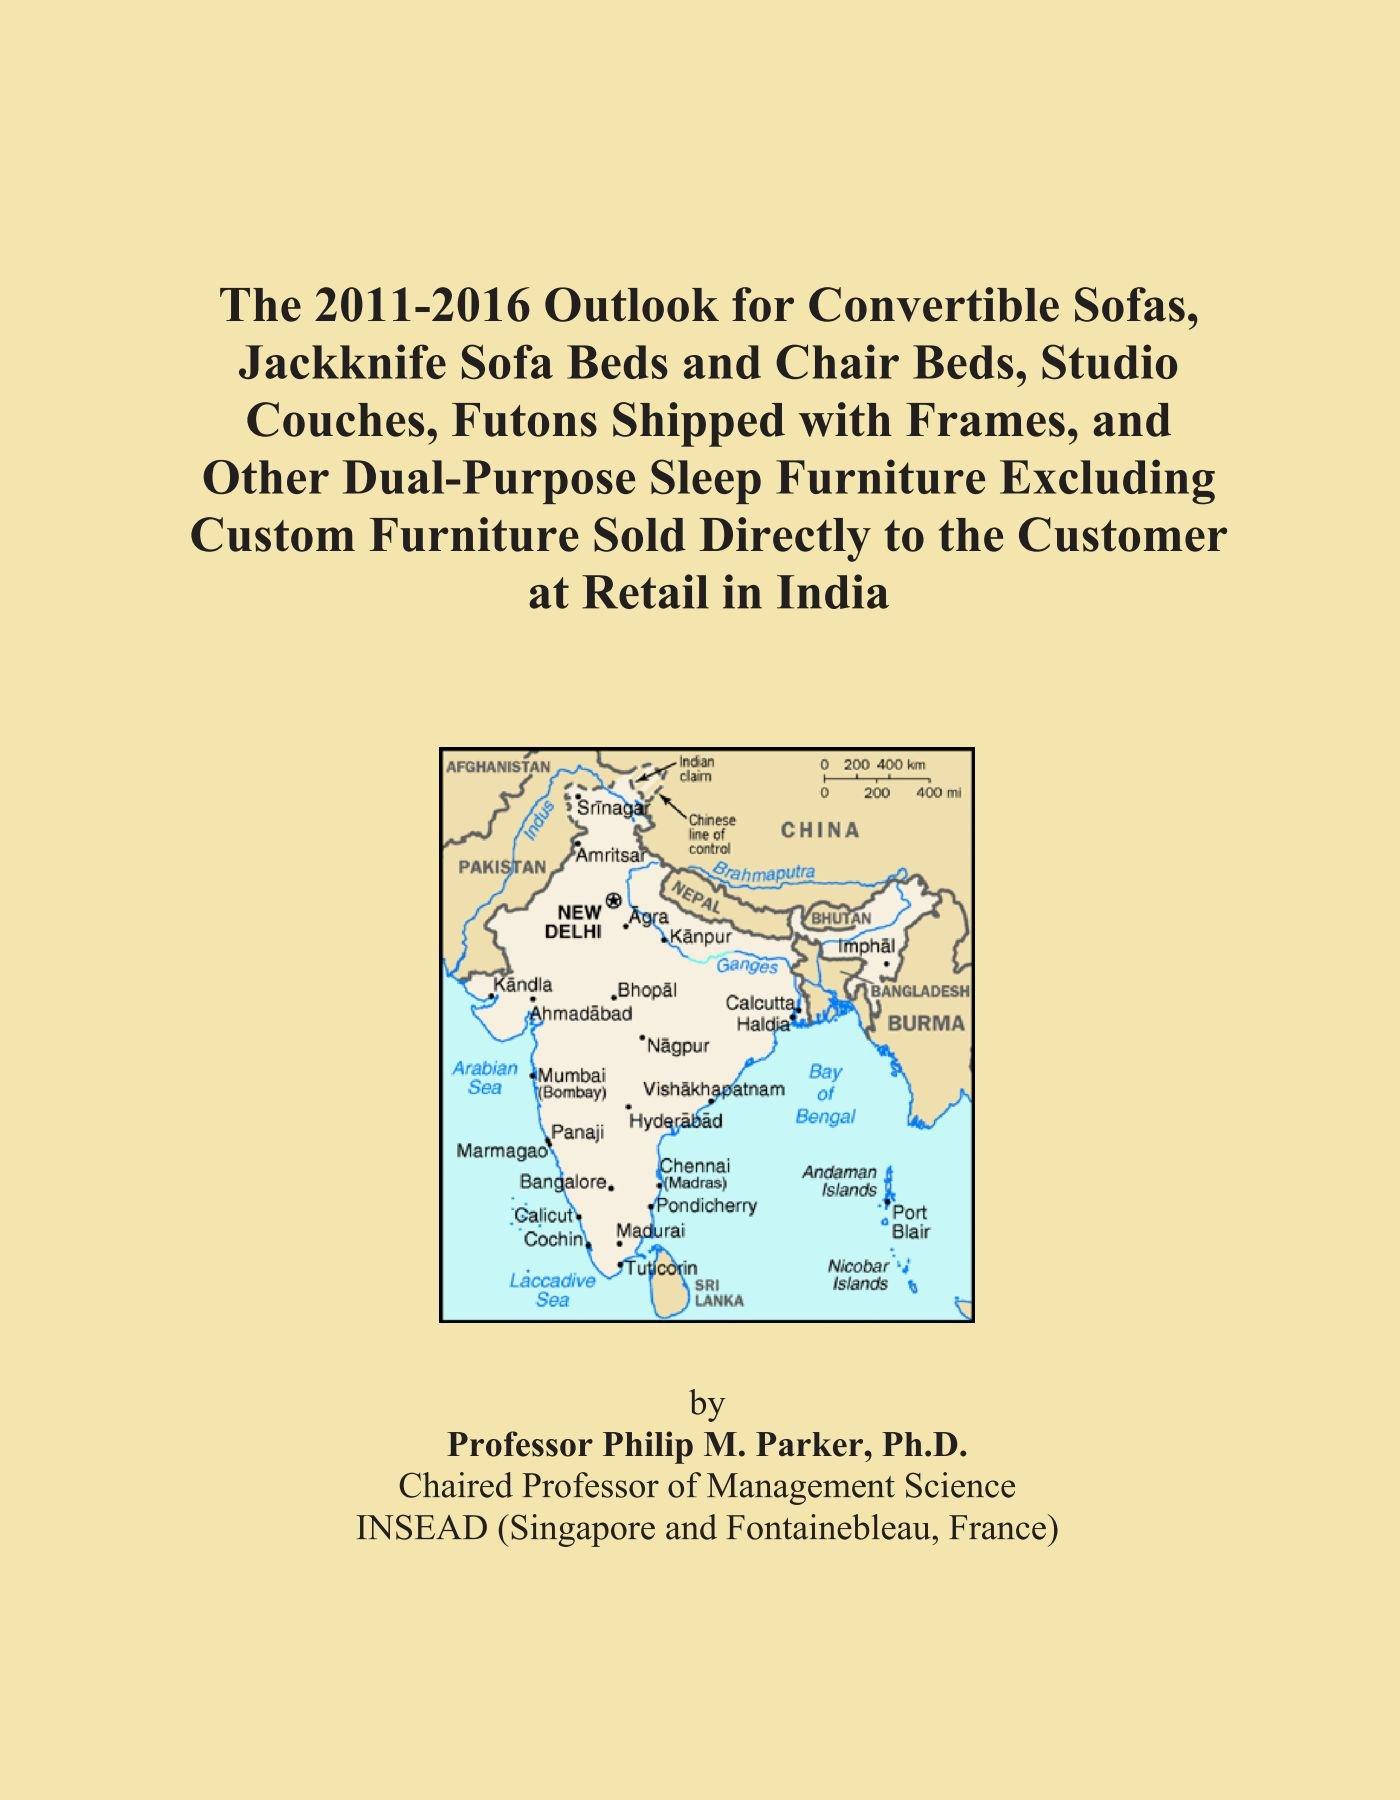 The 2011-2016 Outlook for Convertible Sofas, Jackknife Sofa ...